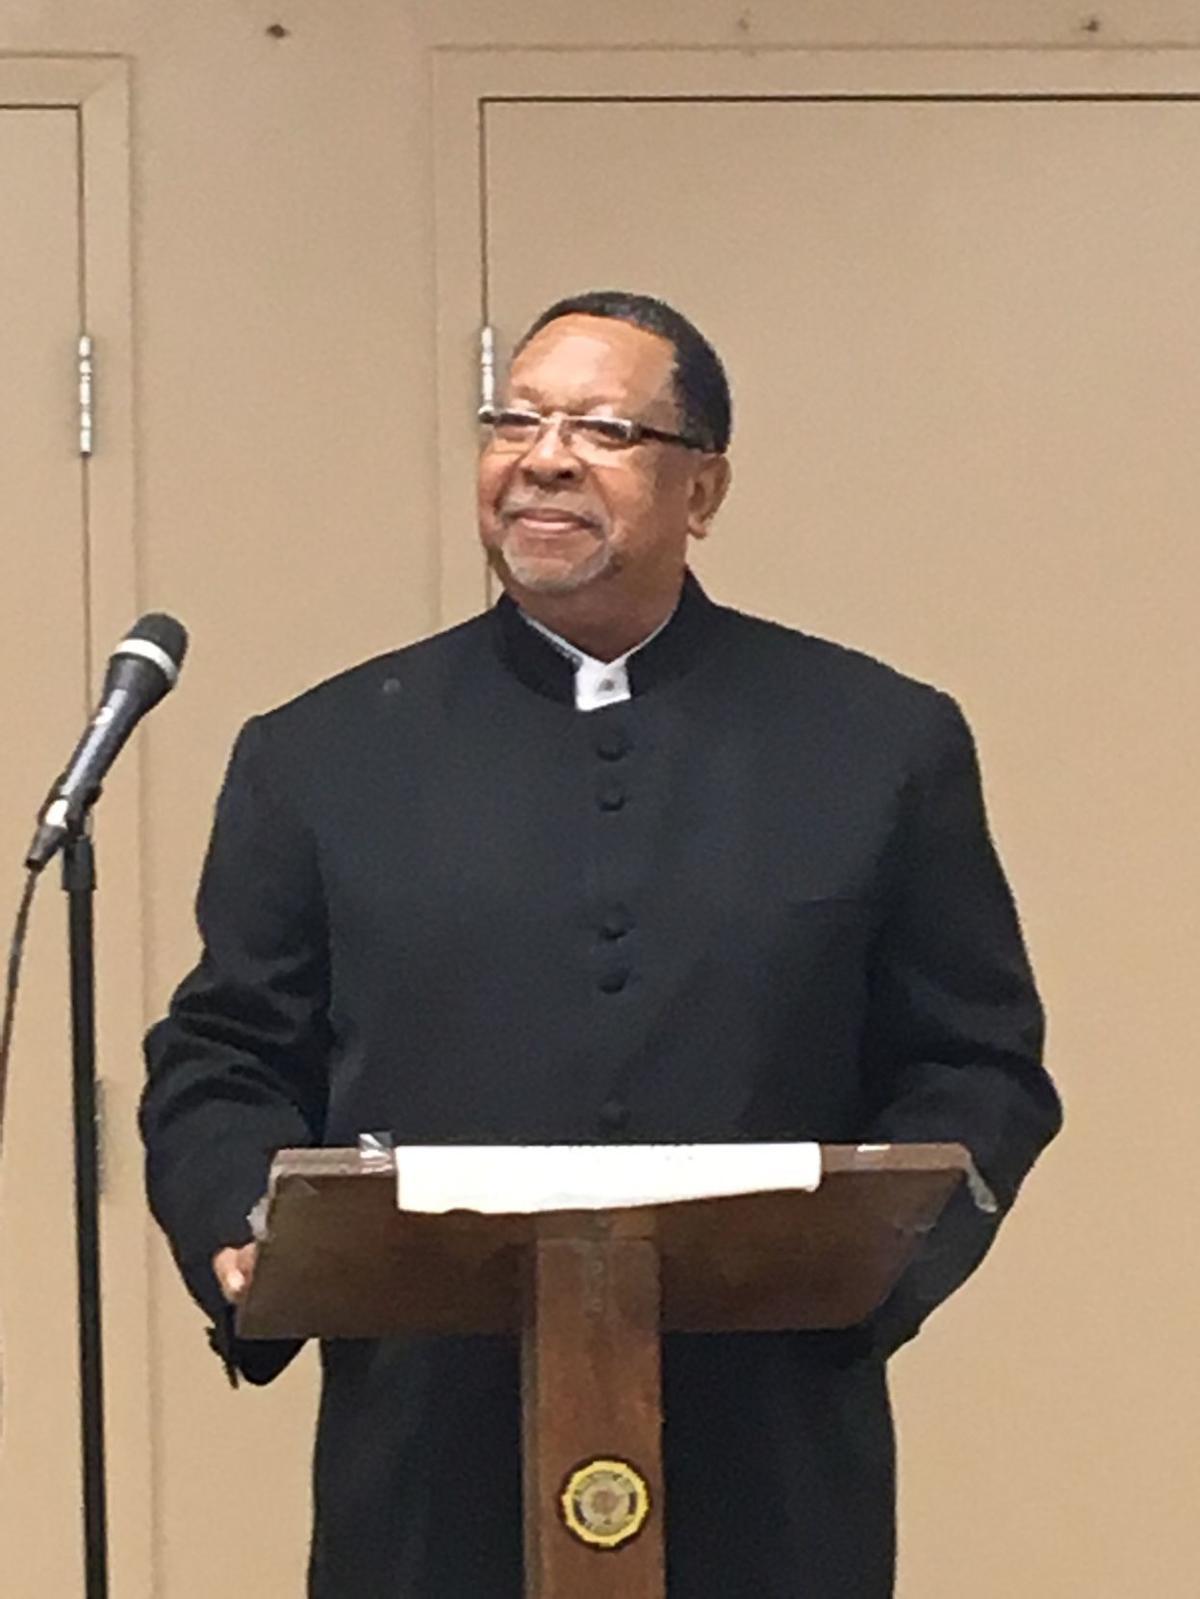 The Rev. Hashmel Turner